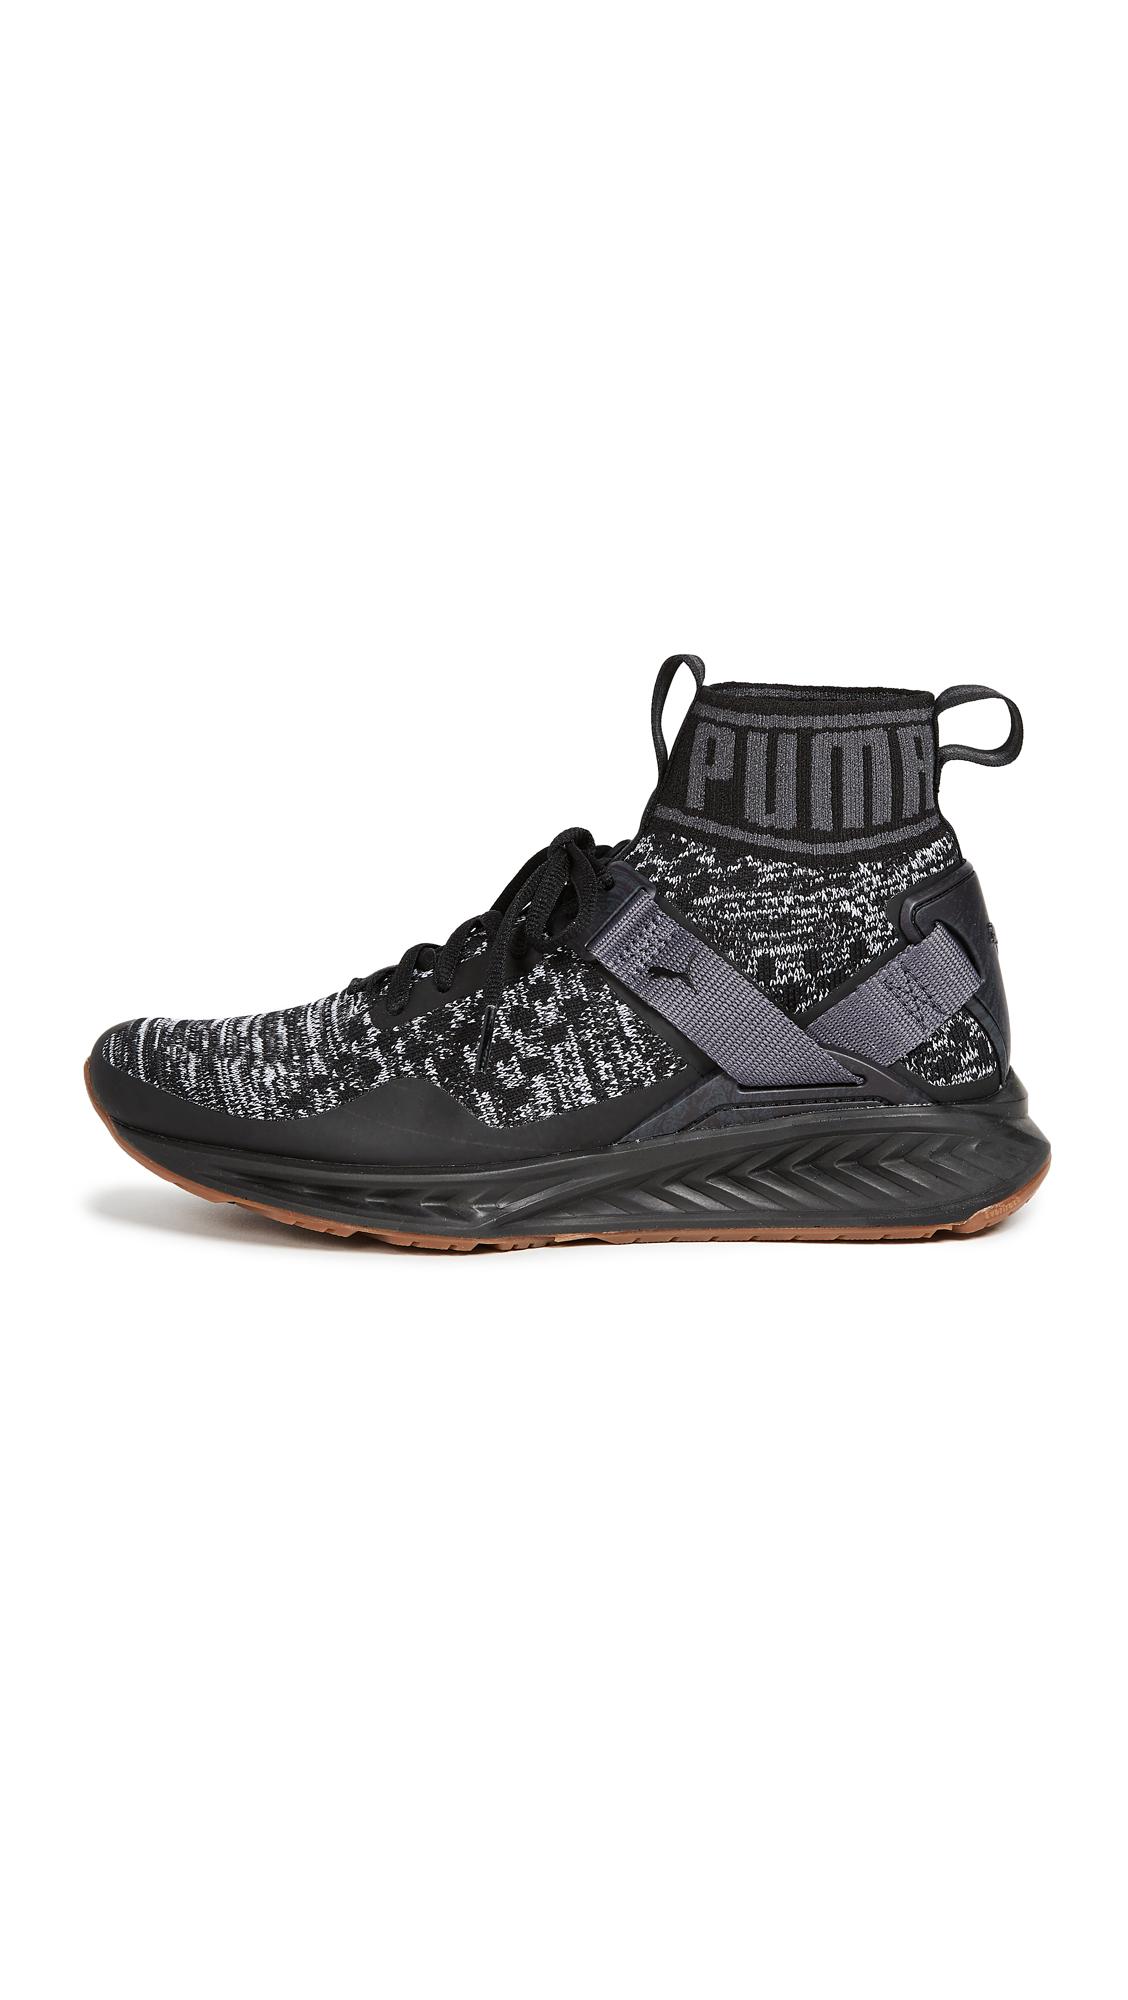 PUMA Ignite evoKNIT Hypernature Sneakers - Black